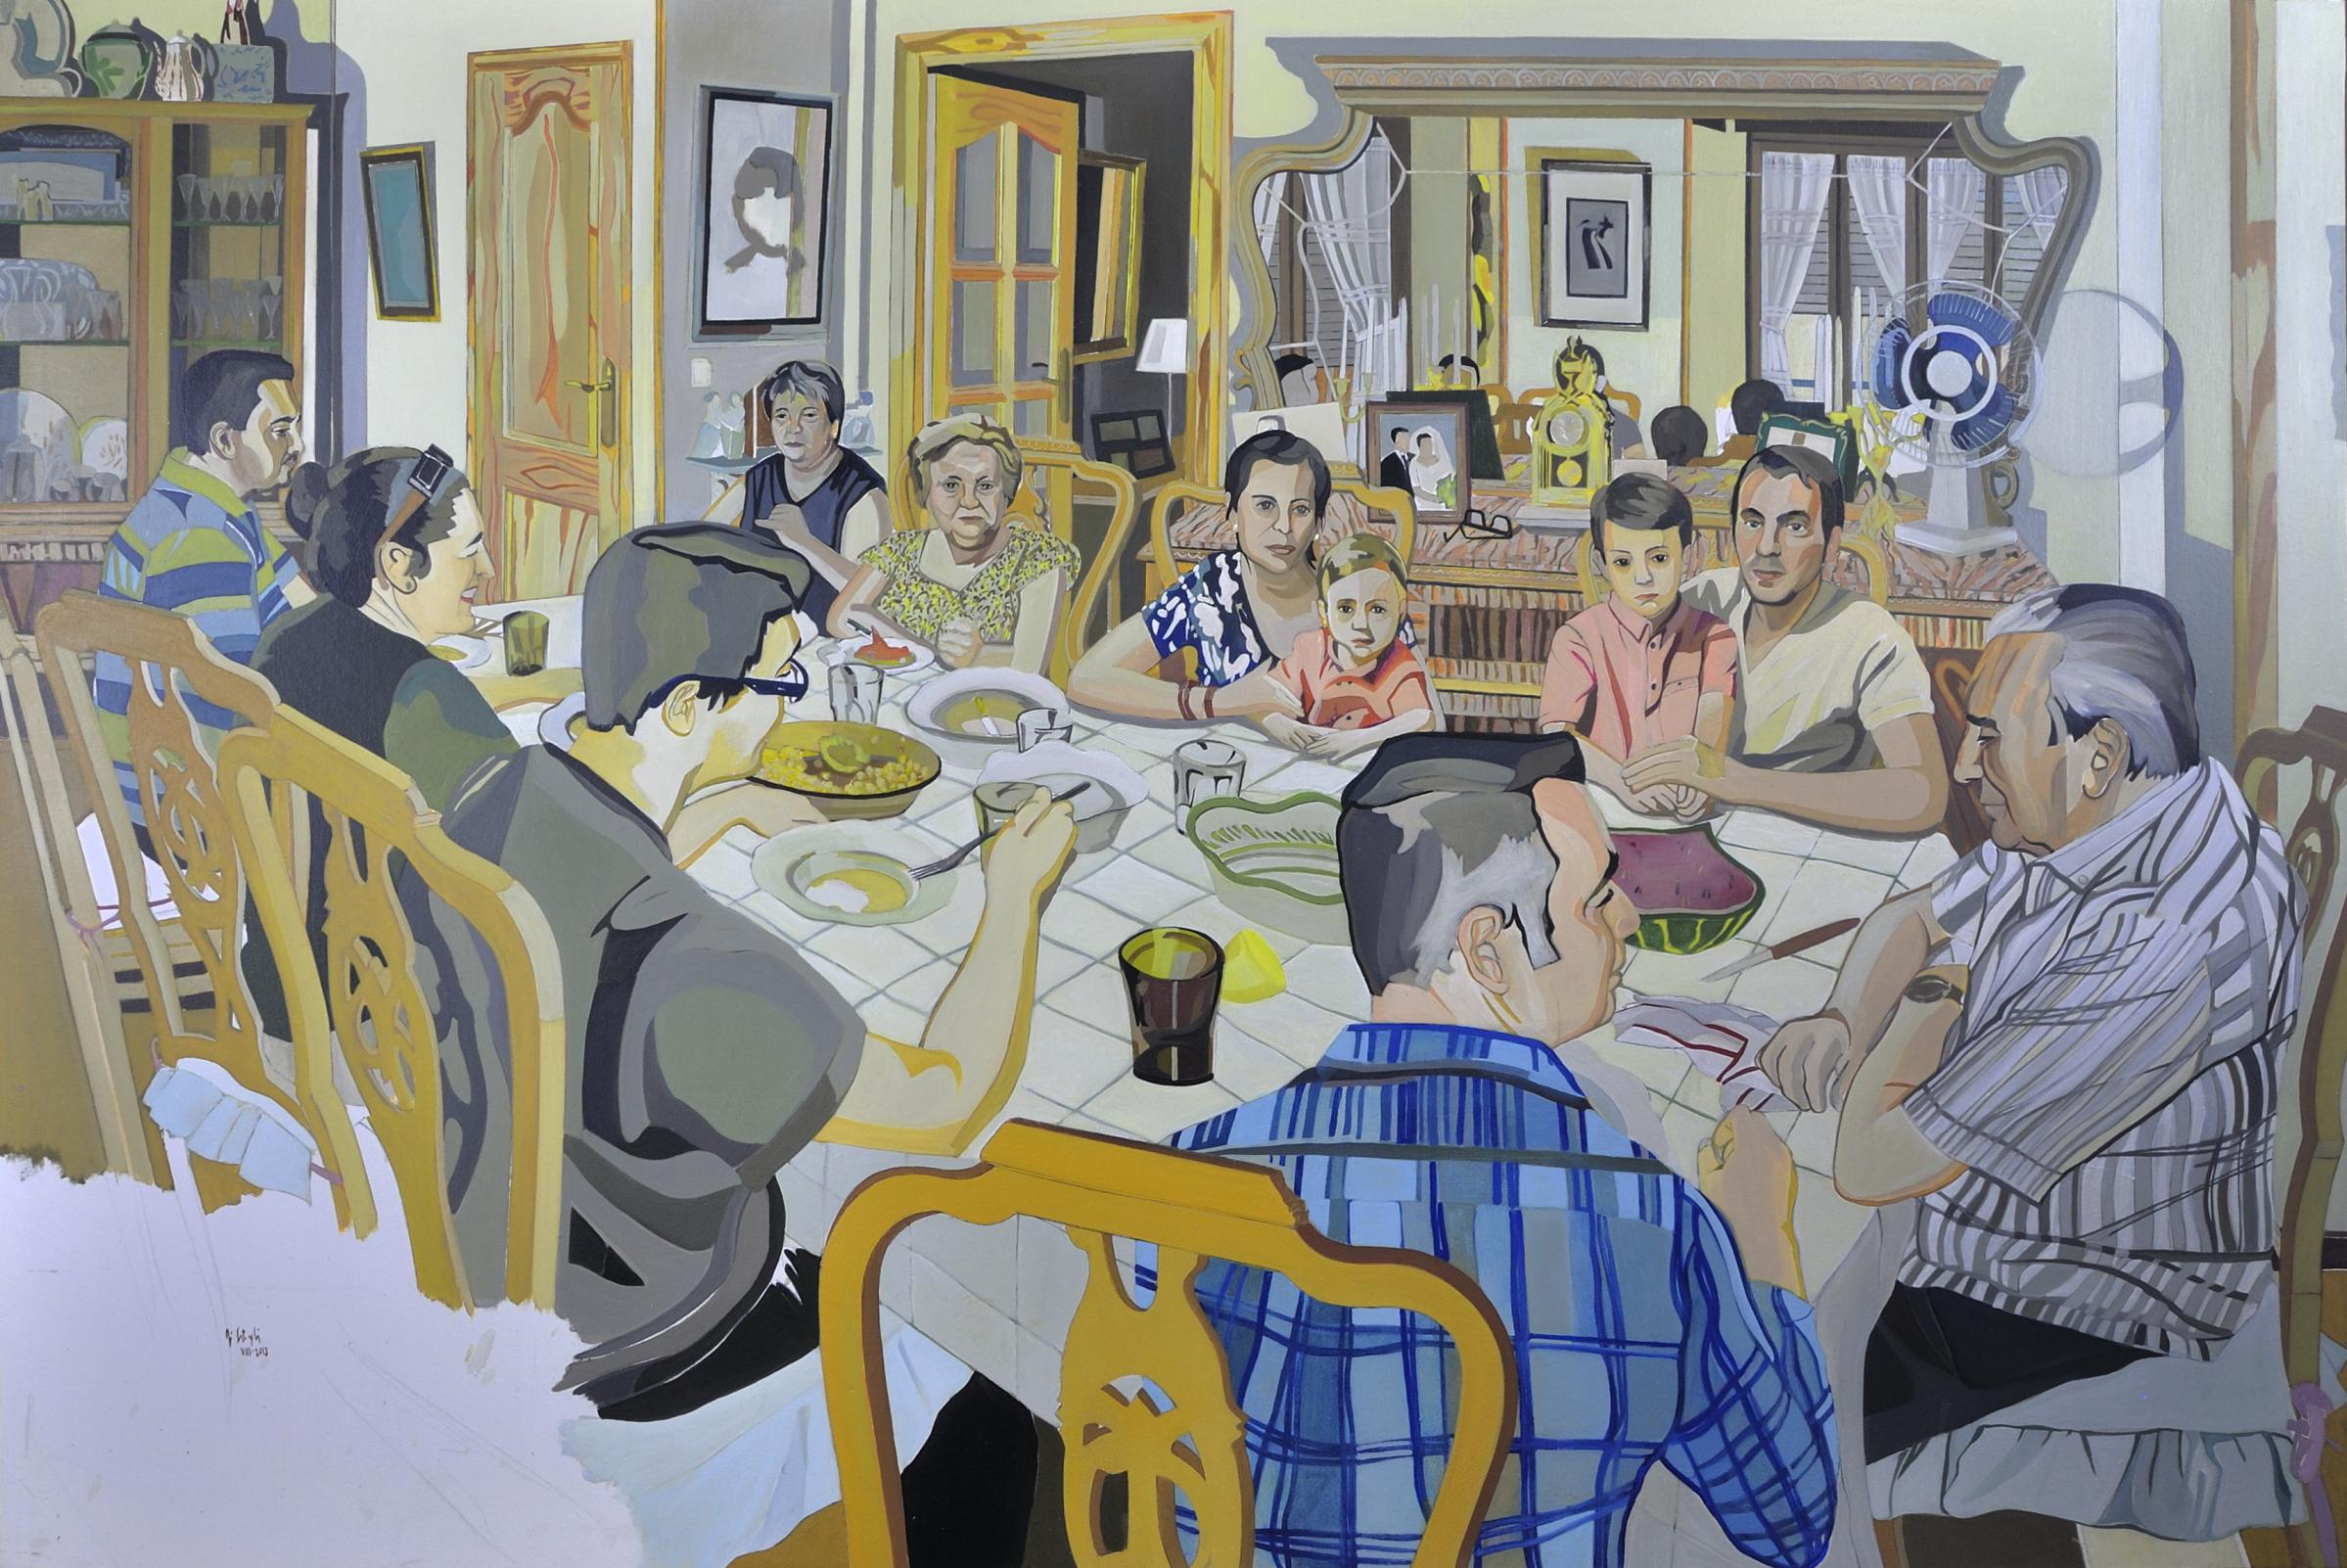 el almuerzo (2015) - Pepe Carretero